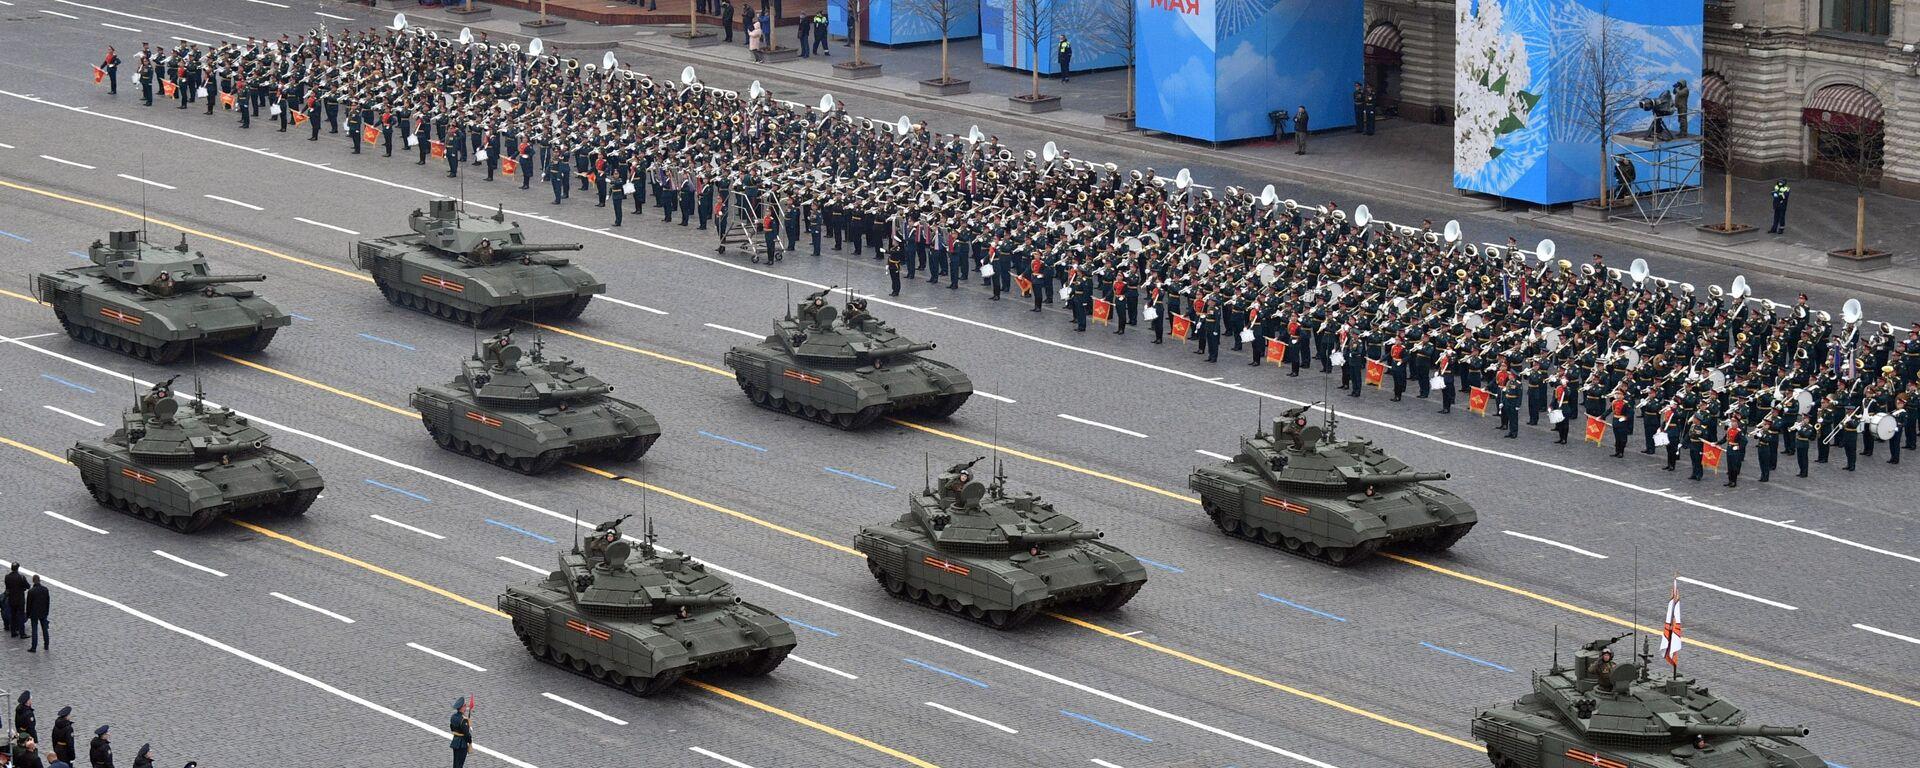 Tenkovi T-90M i T-14 Armata na vojnoj paradi povodom obeležavanja 76. godišnjice pobede u Velikom otadžbinskom ratu - Sputnik Srbija, 1920, 23.05.2021